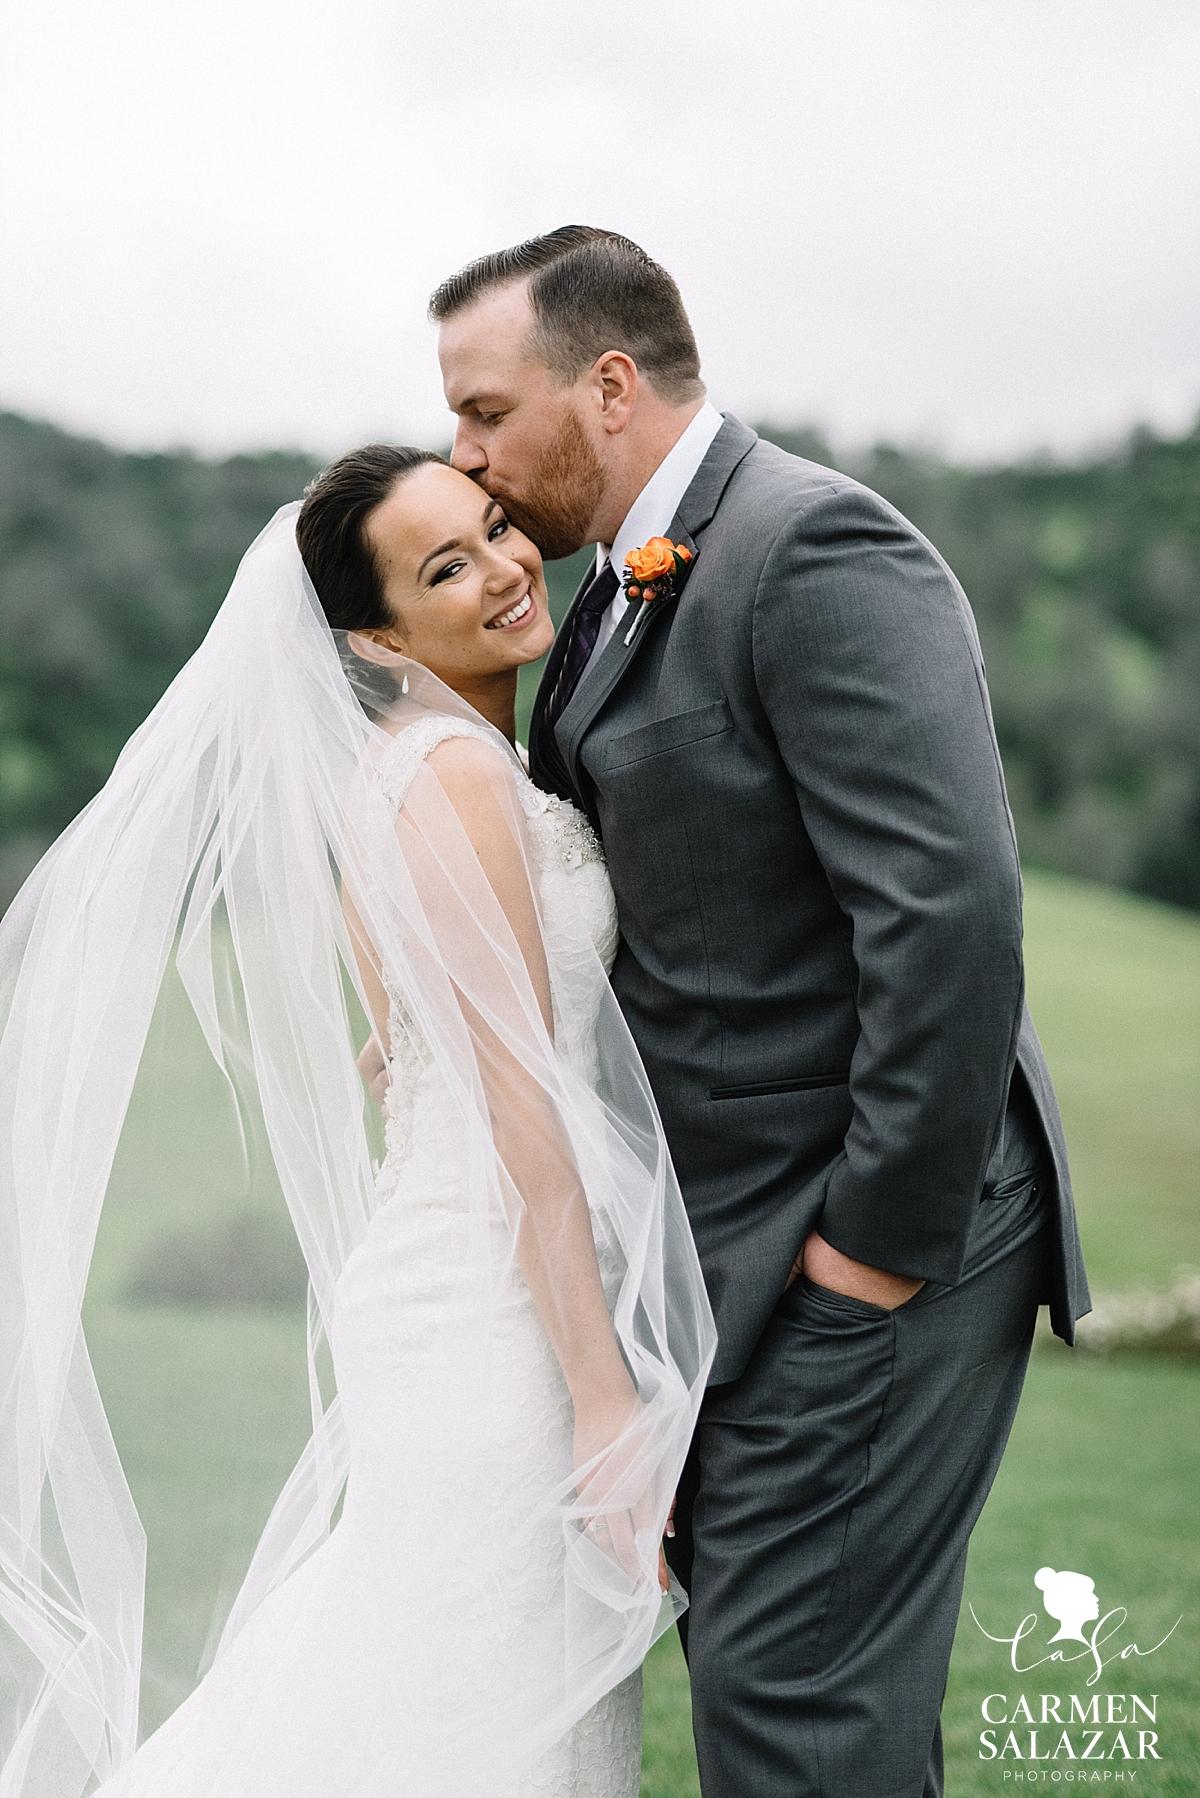 Sweet bride and groom portraits - Carmen Salazar